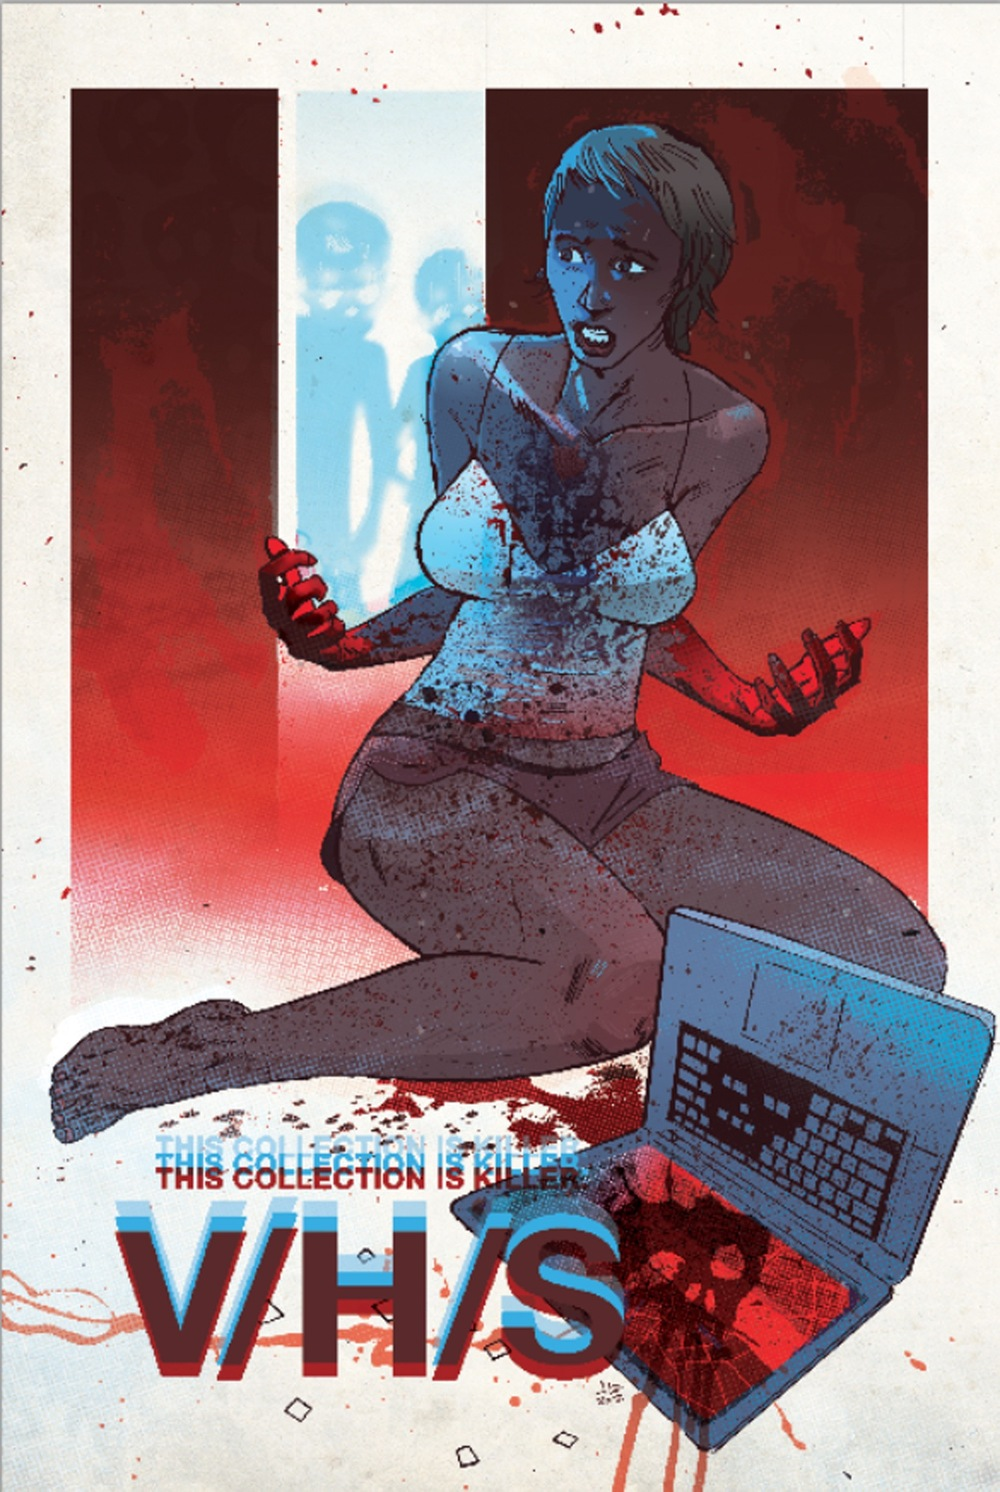 VHS Poster Joe Swanberg.jpg